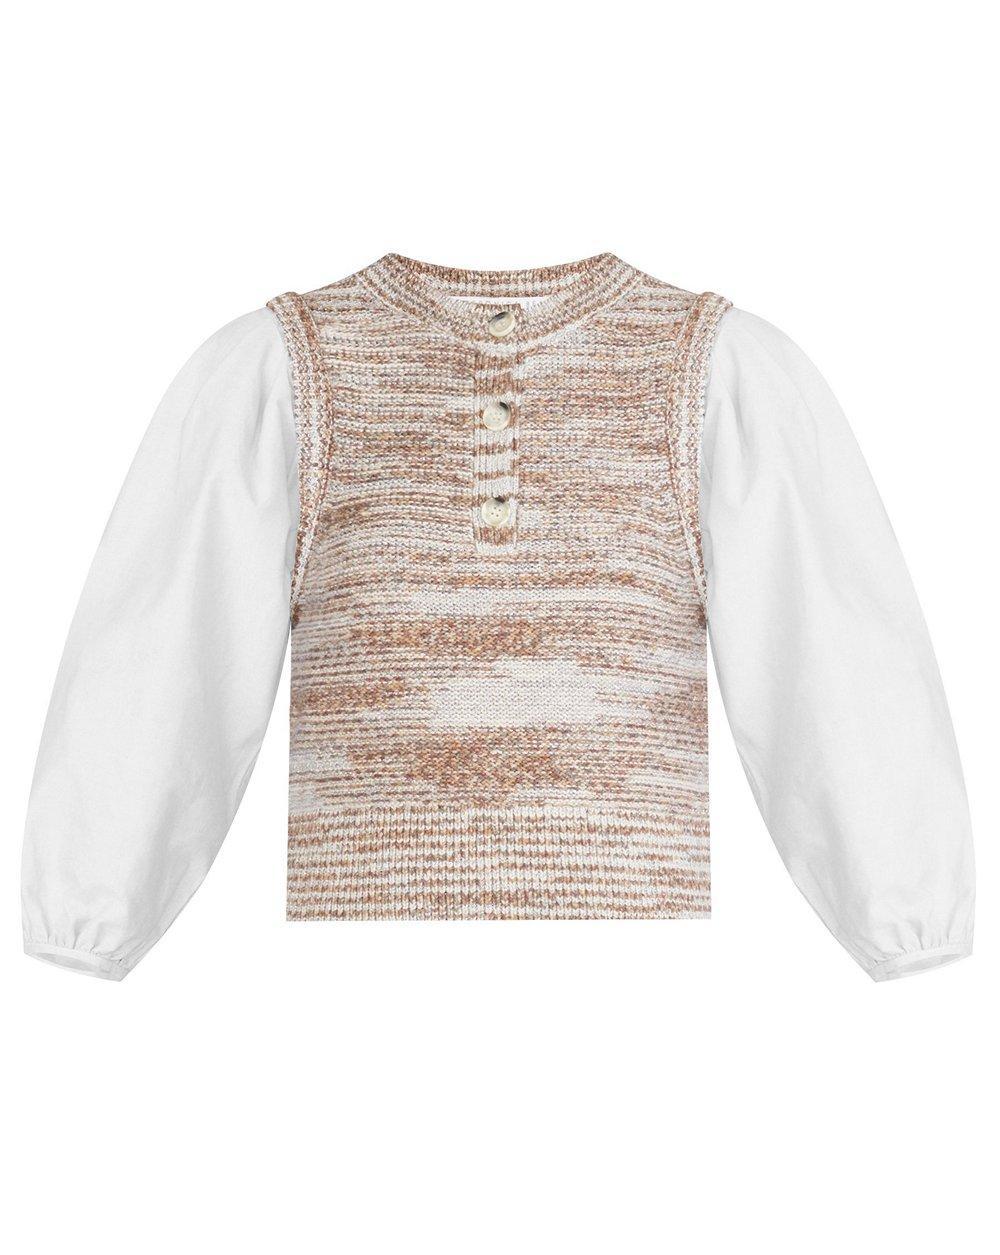 Tahlea Mixed Media Sweater Item # 2107KN5419602